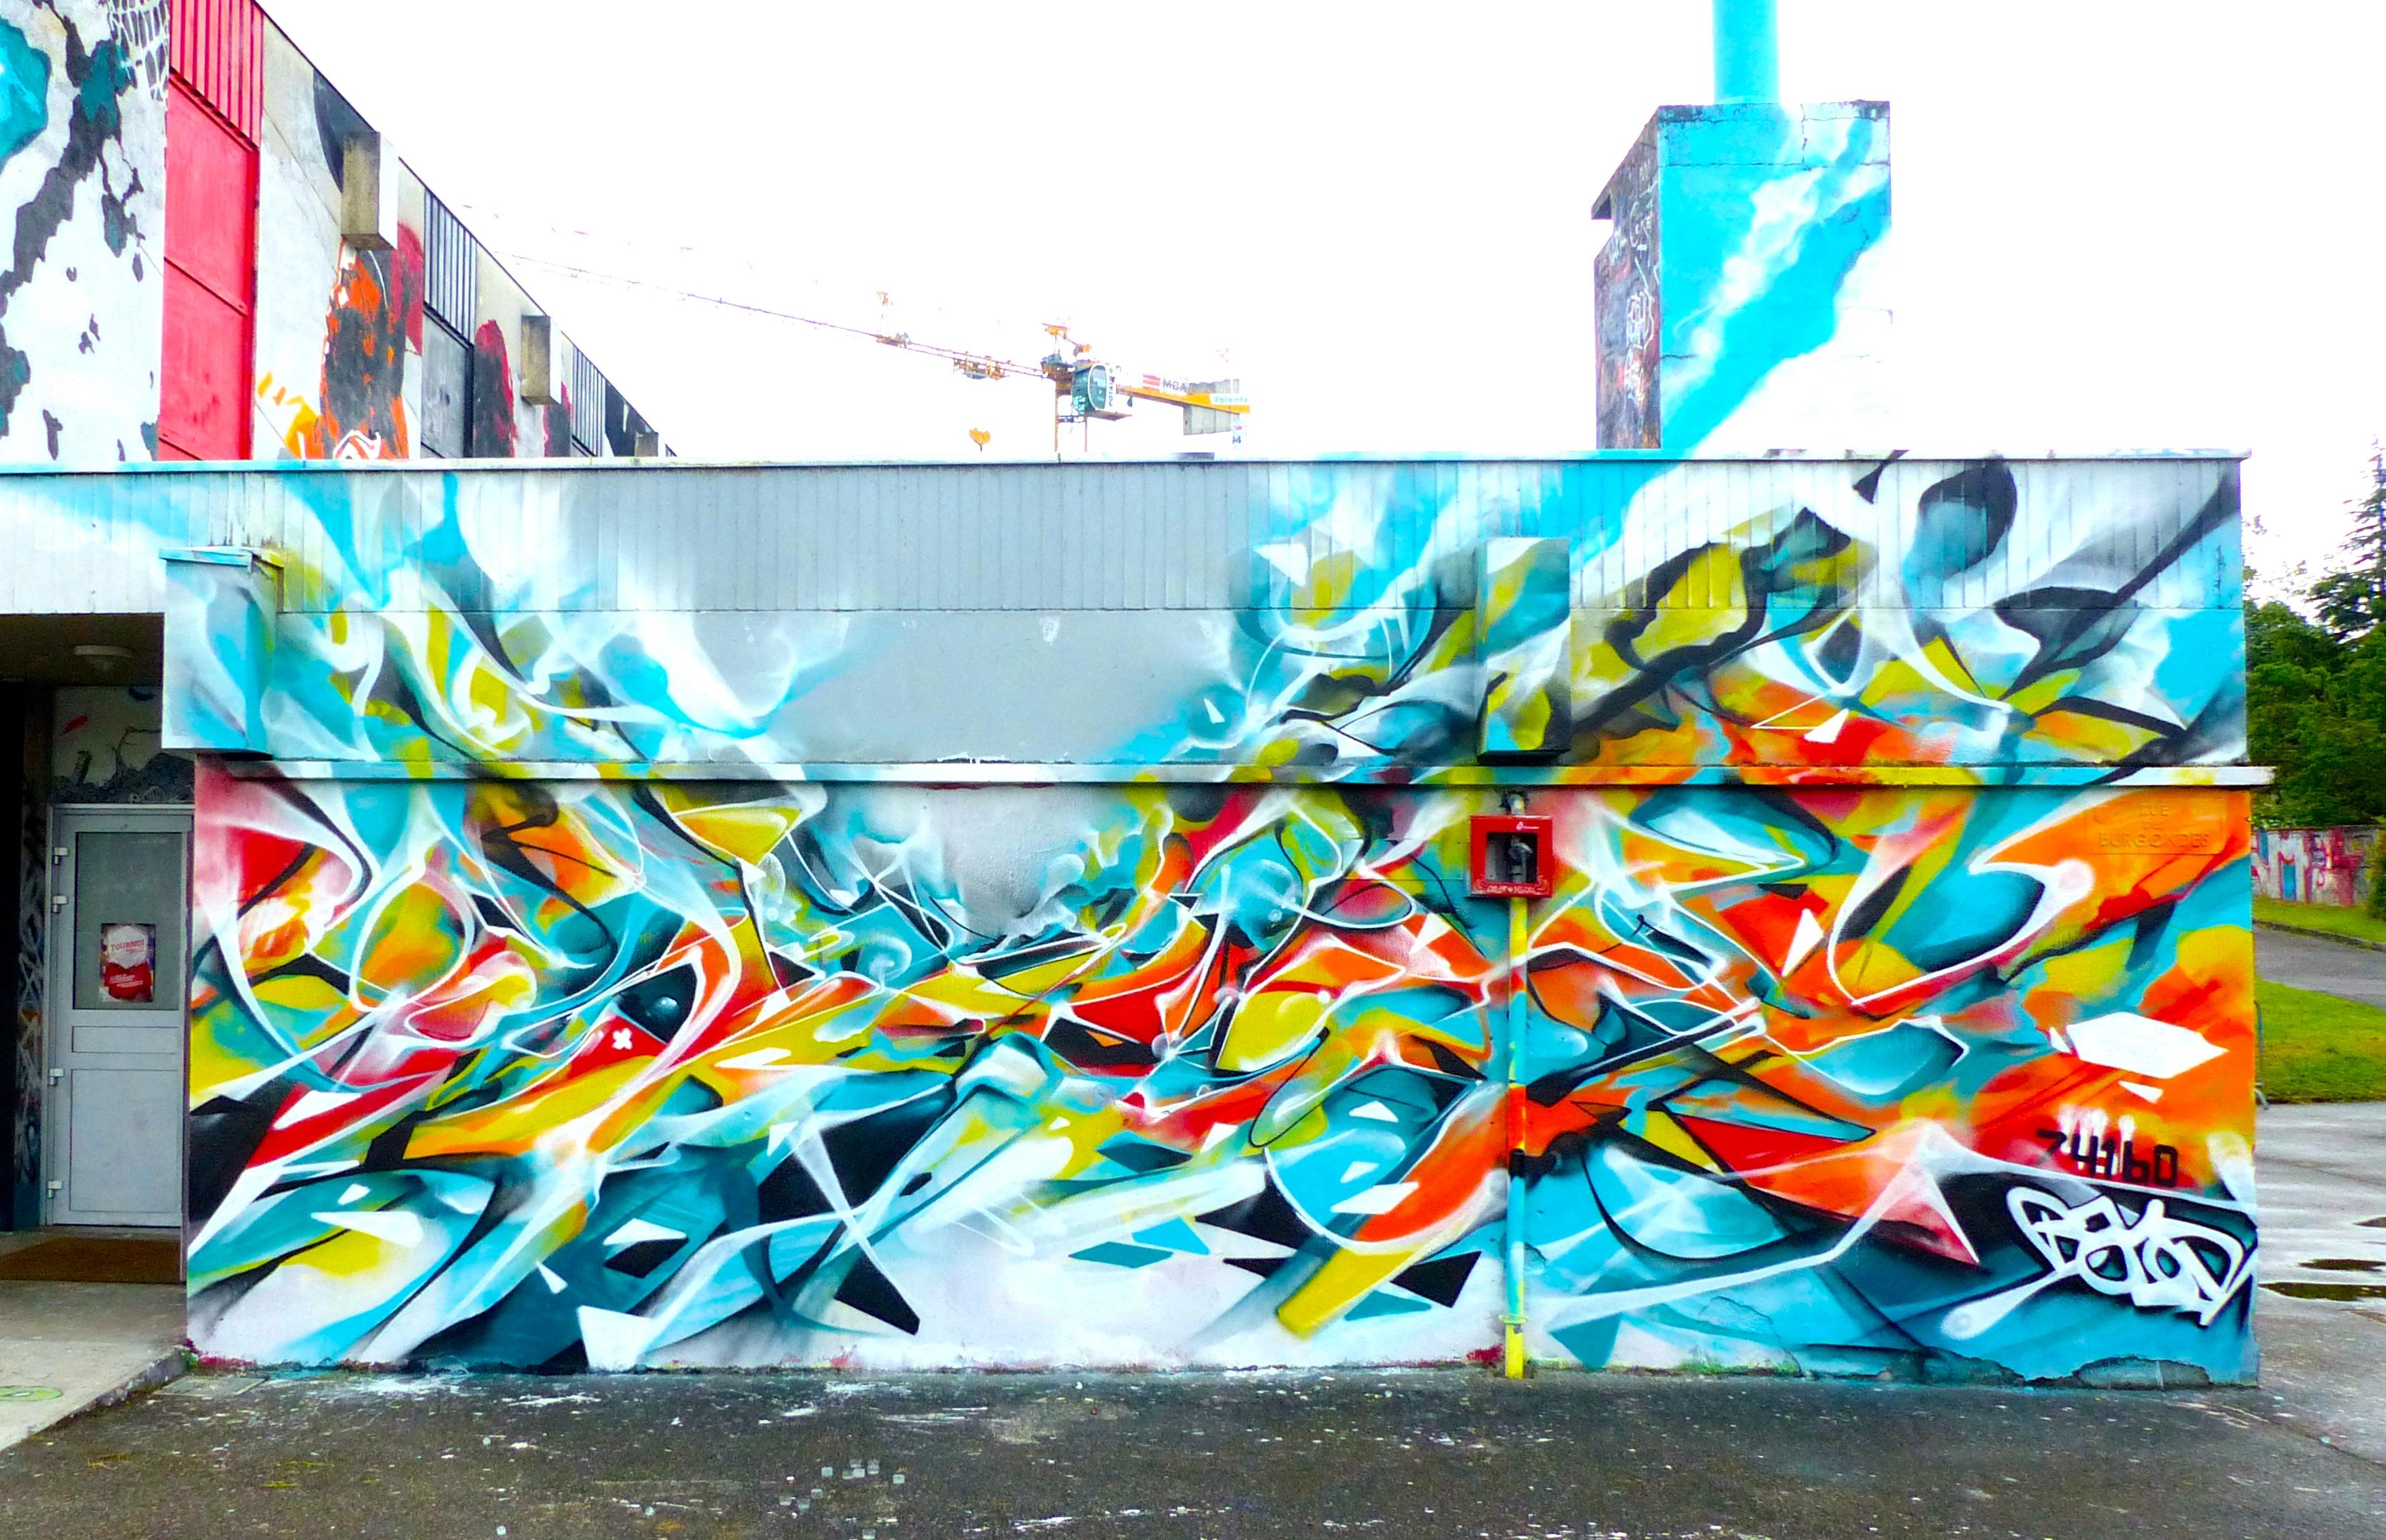 muralisme graffiti abstrait fresque 74160 nadib bandi graffiti mural. Black Bedroom Furniture Sets. Home Design Ideas